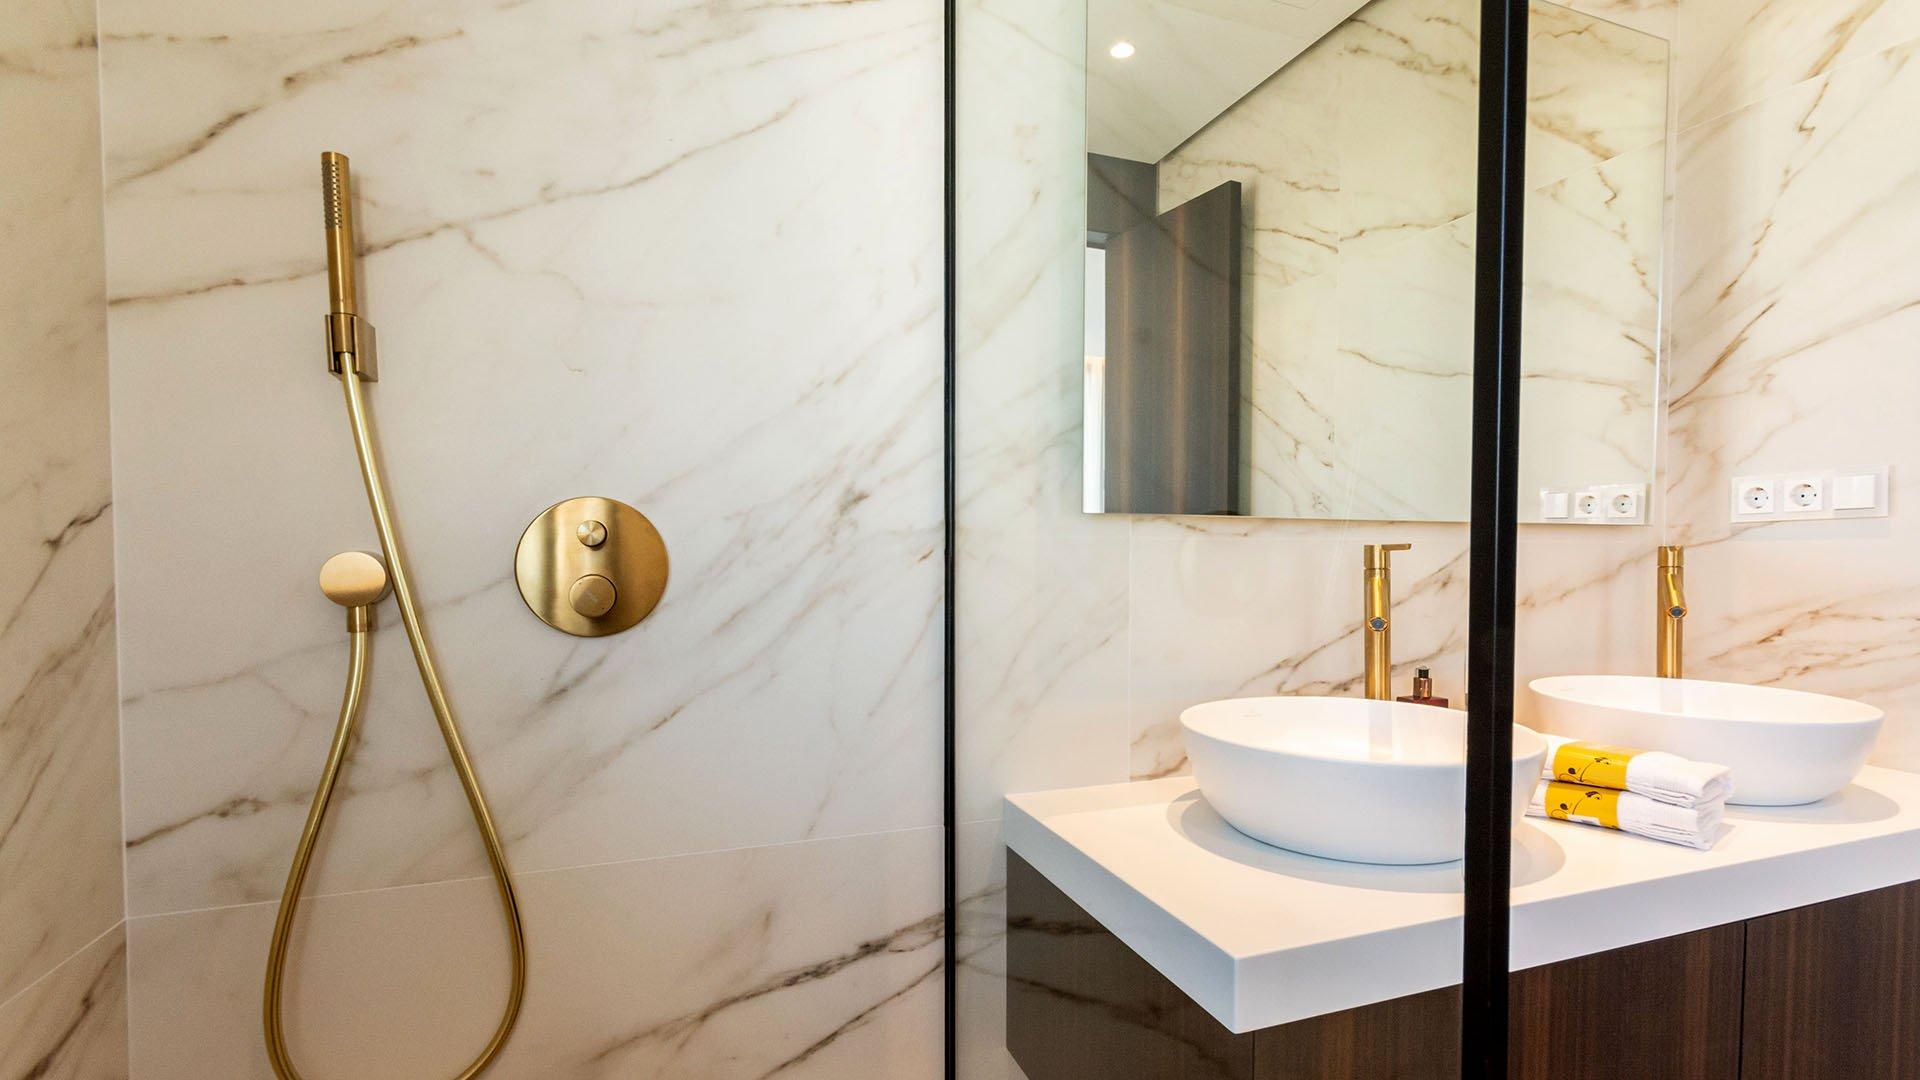 Amapura: Luxury villas in an exclusive residential area in Marbella